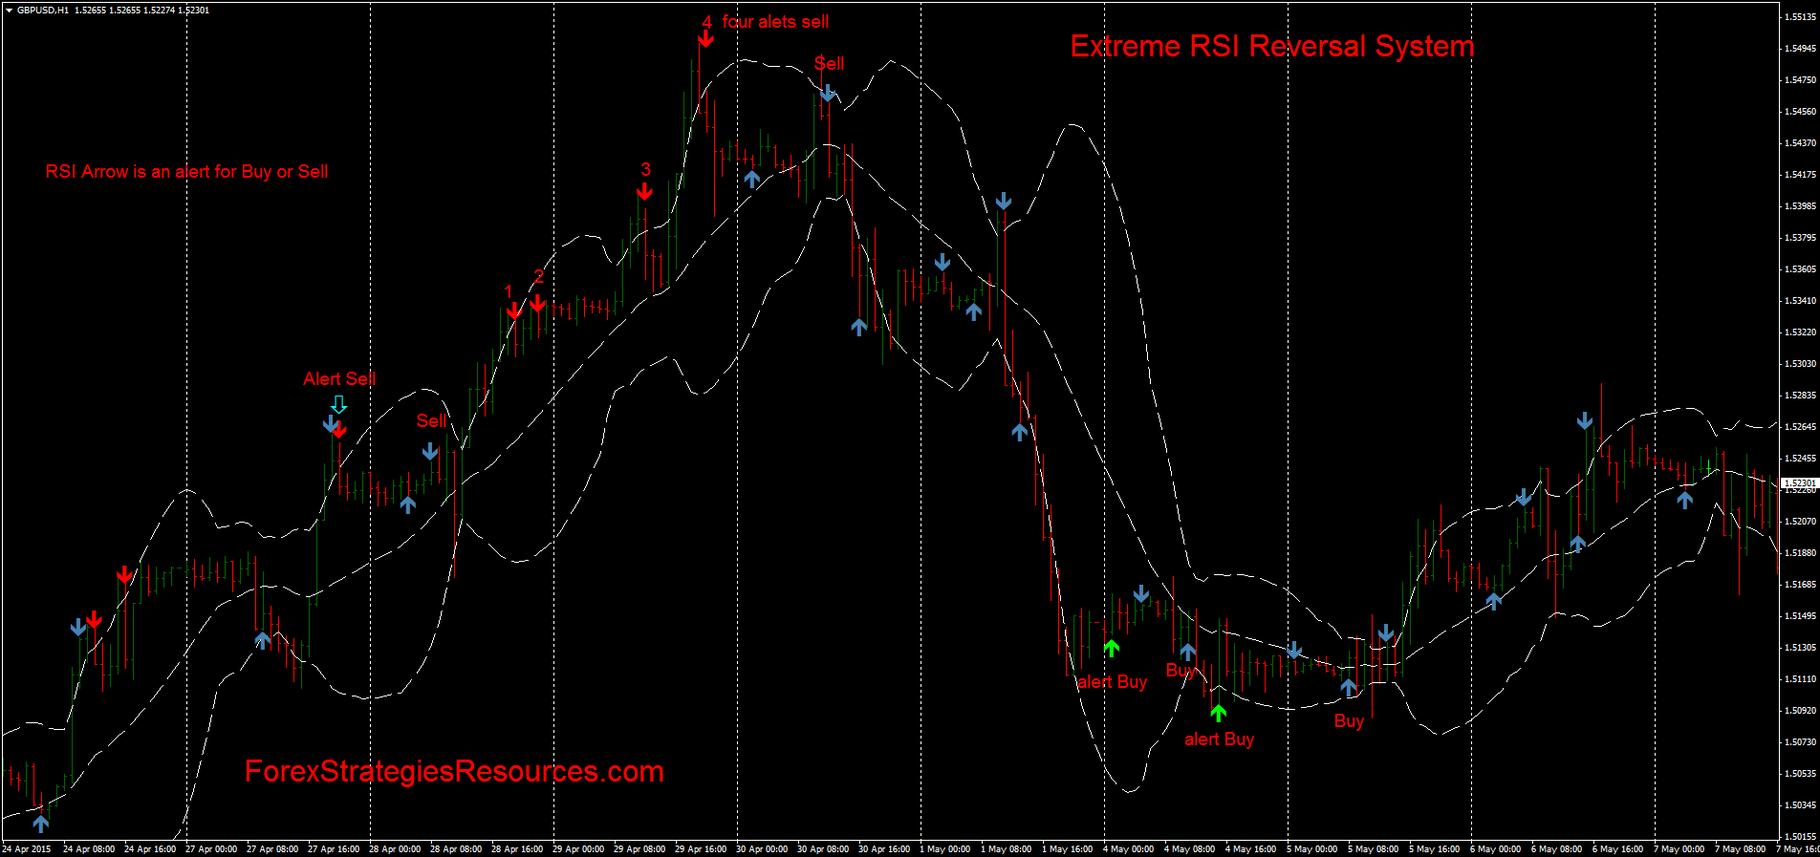 Super reversal trading system